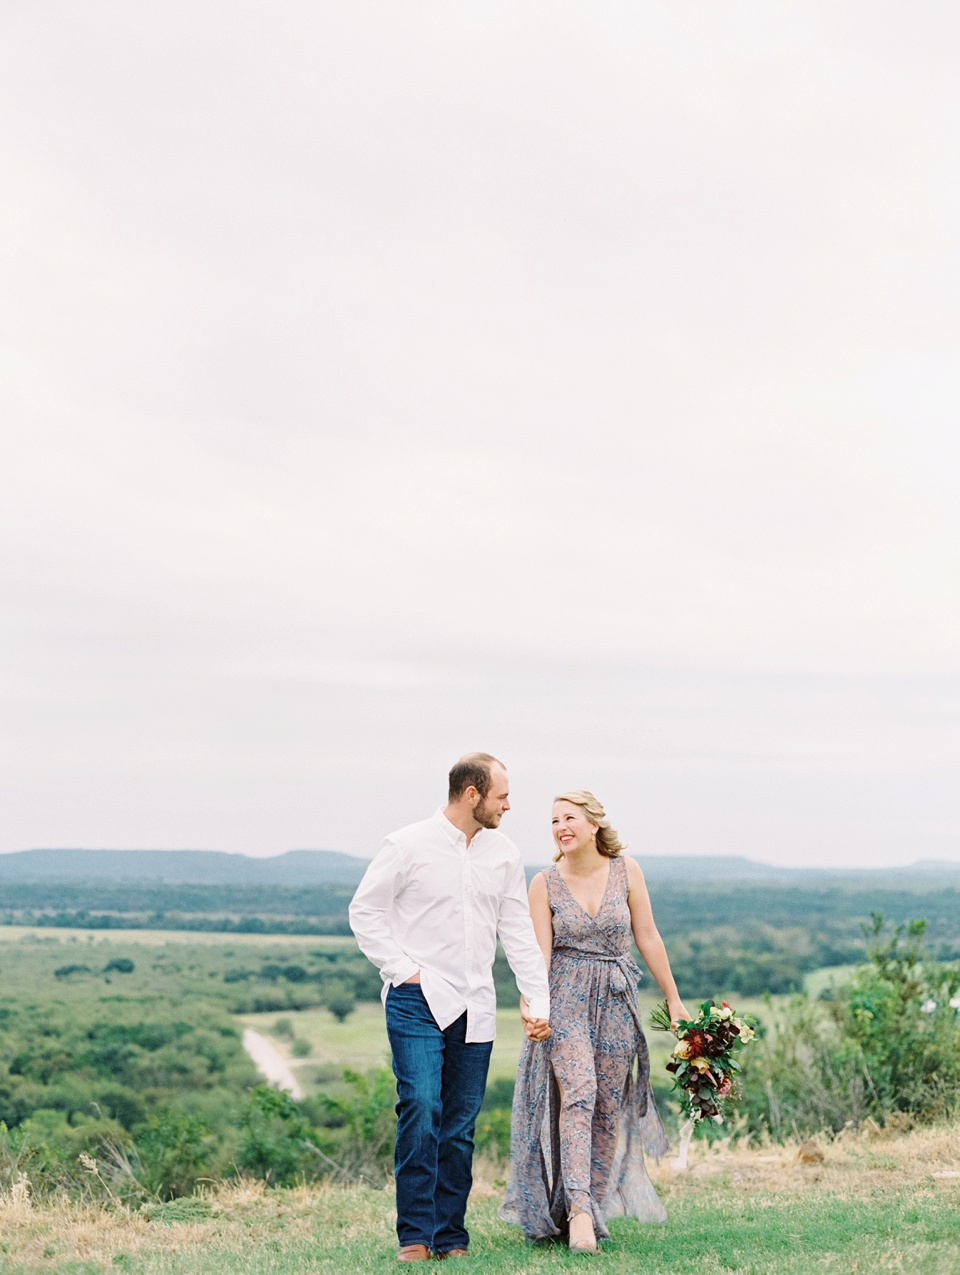 Becca Lea Photography | Dallas Wedding Photographer